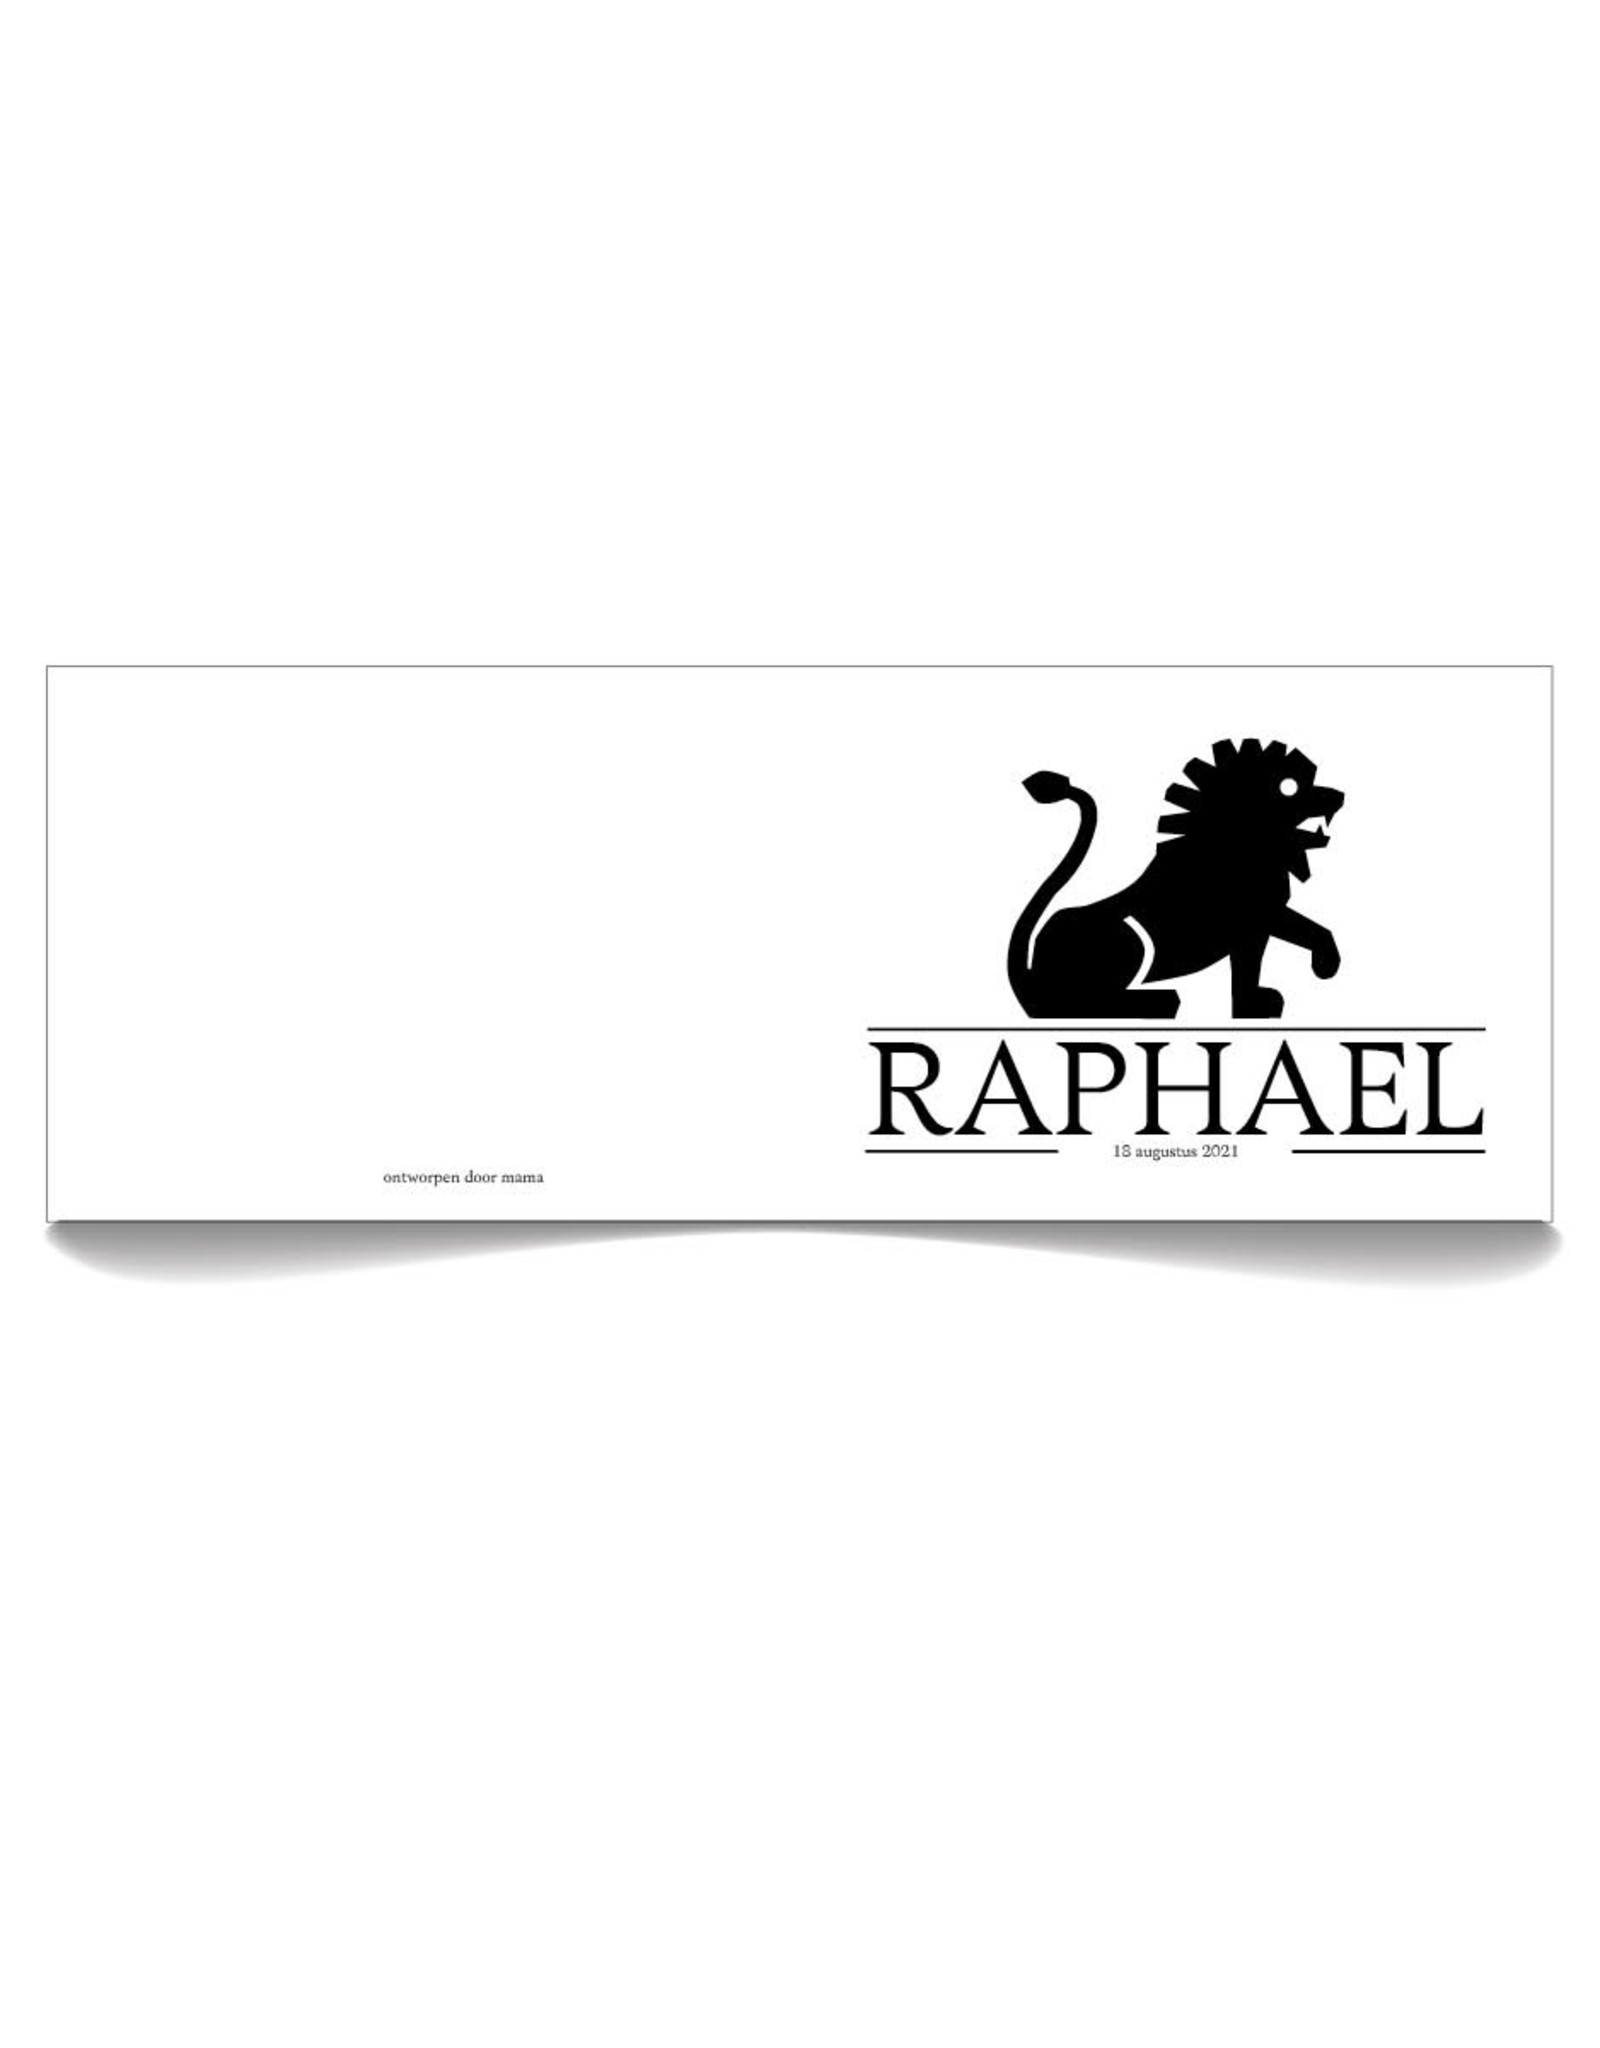 www.Robin.cards Geboortekaartje premium gevouwen rechthoek RAPHAEL